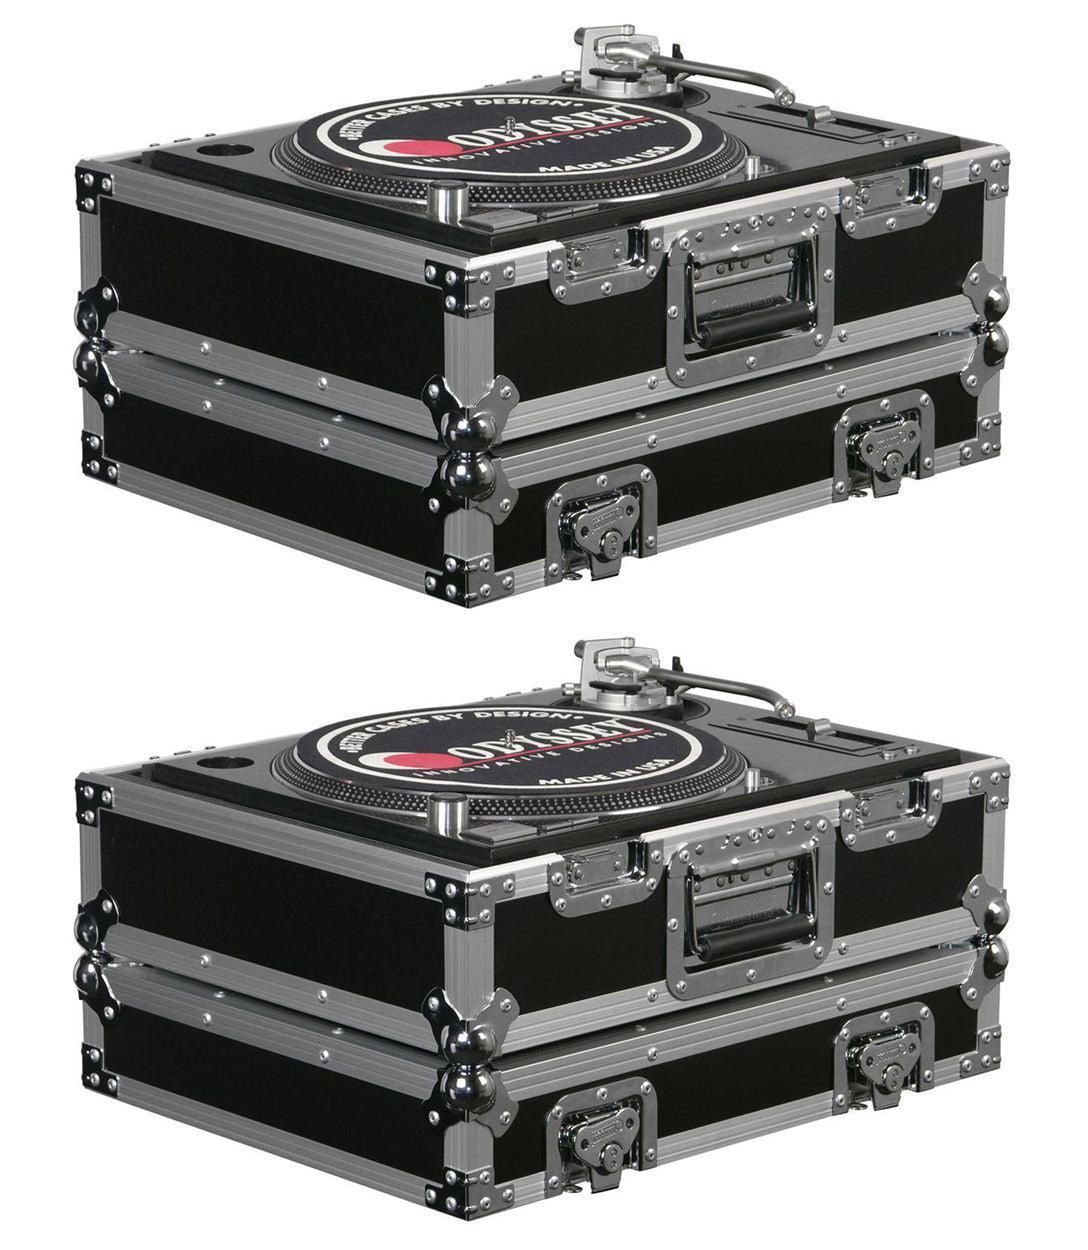 (2) Odyssey FR1200E ATA Universal Pro DJ Turntable Flight Road Cases by Odyssey